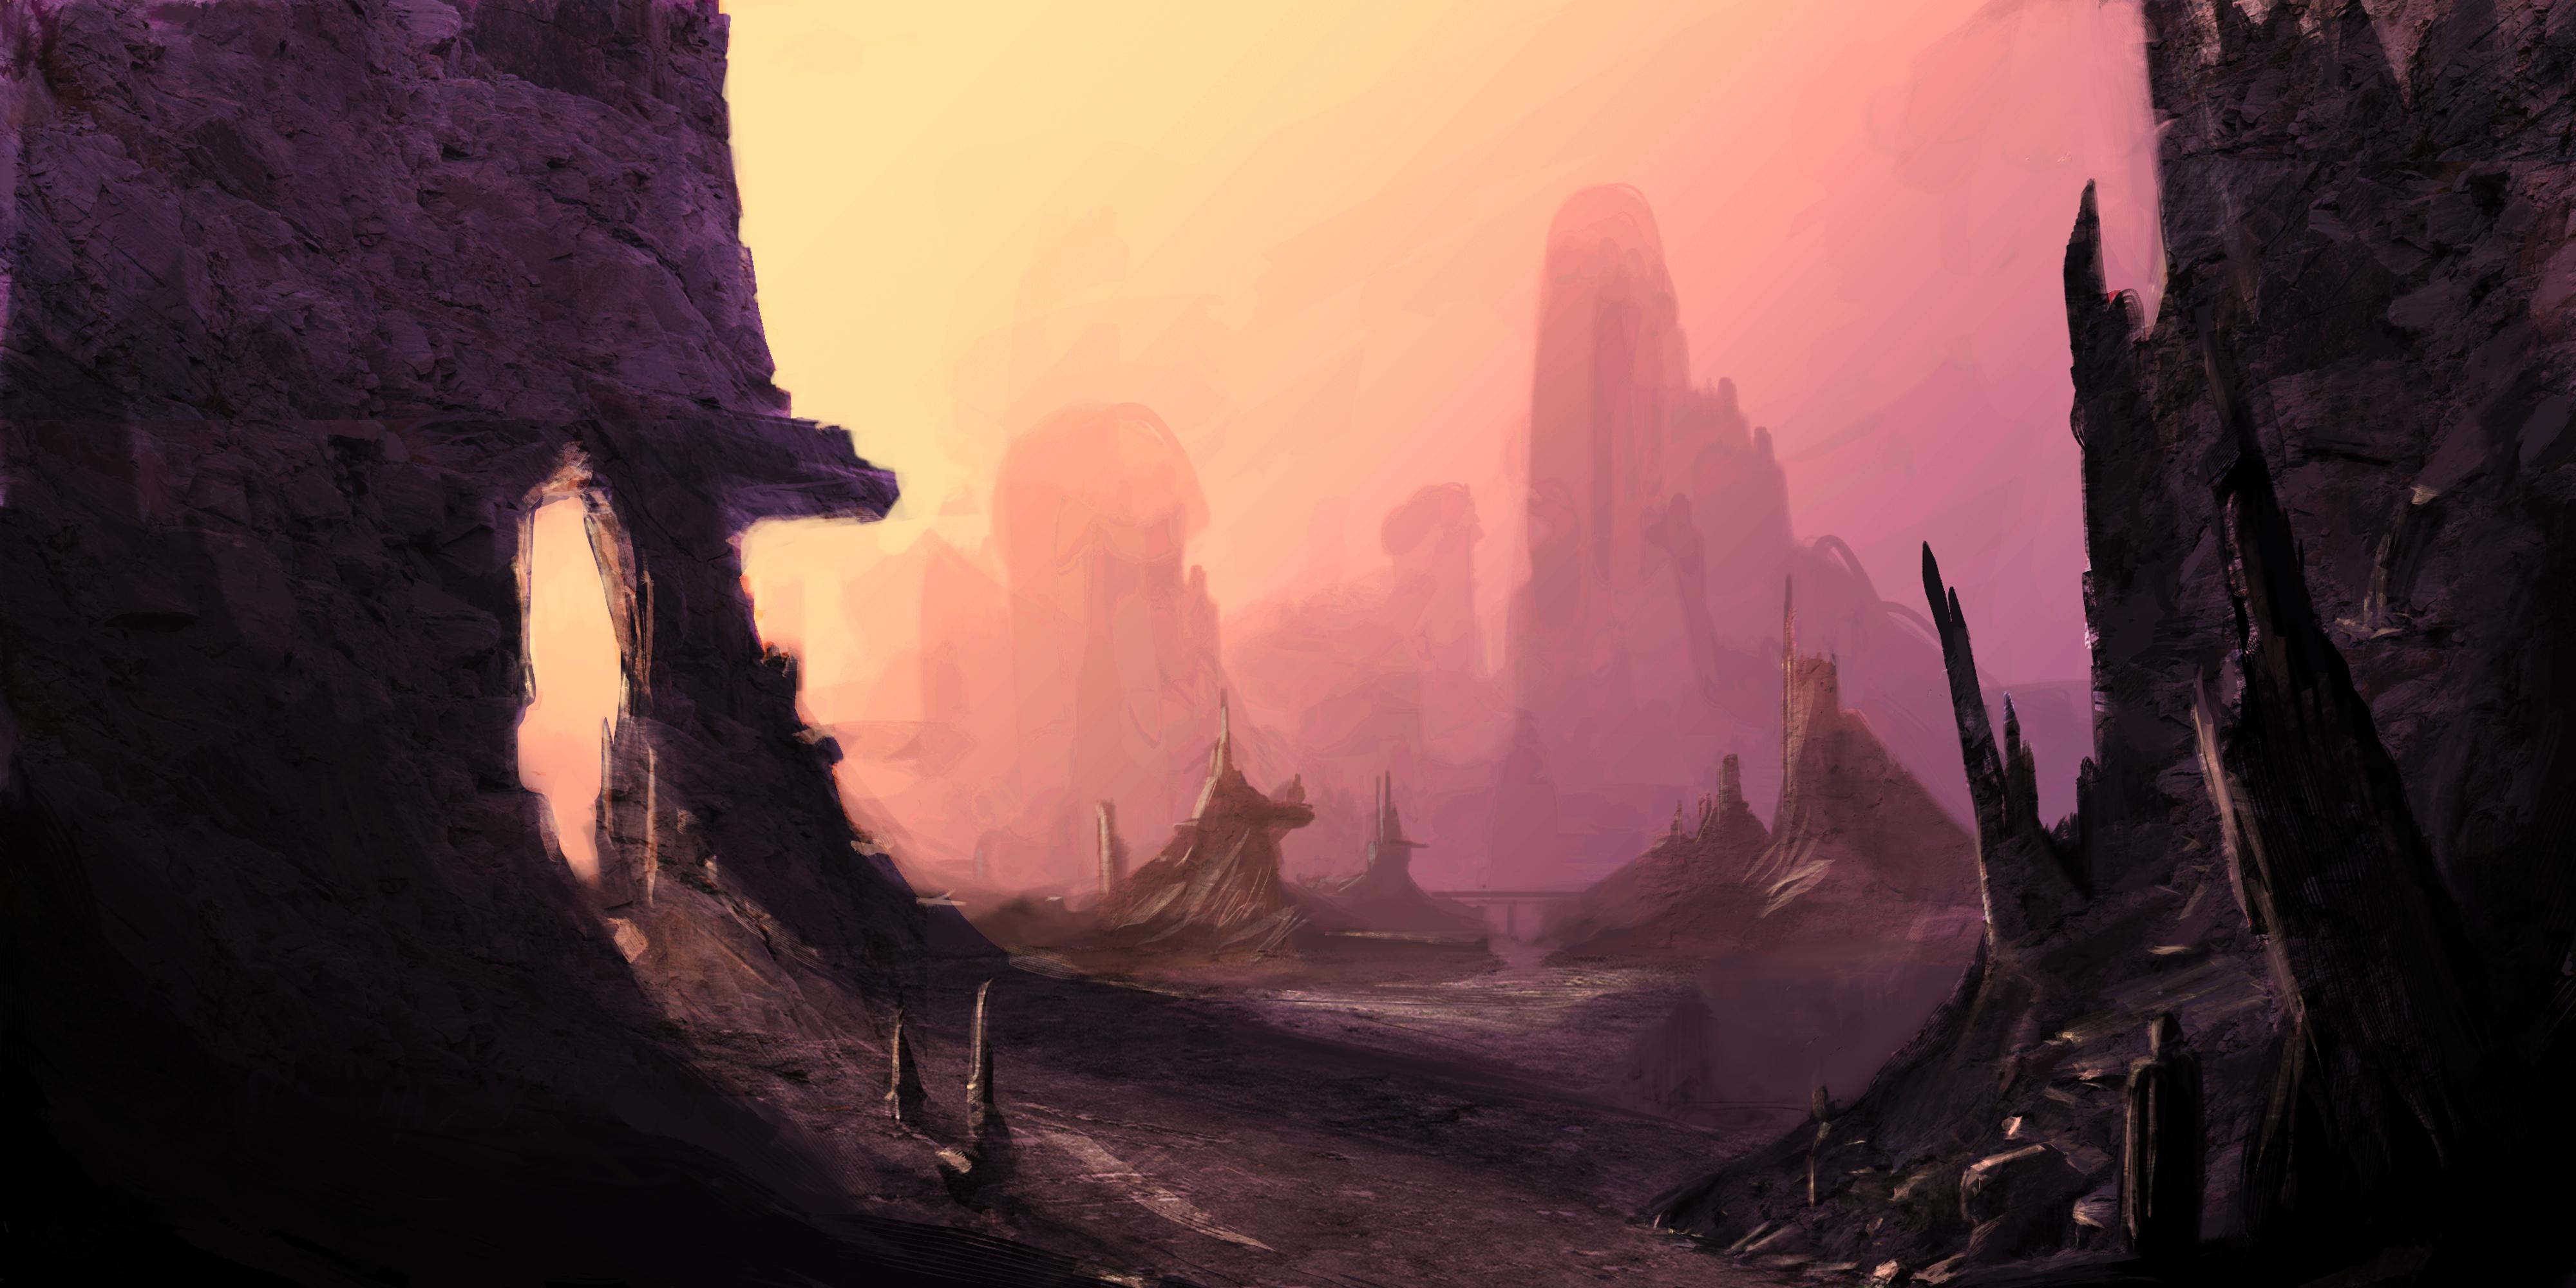 New Beginnings by mmarra12